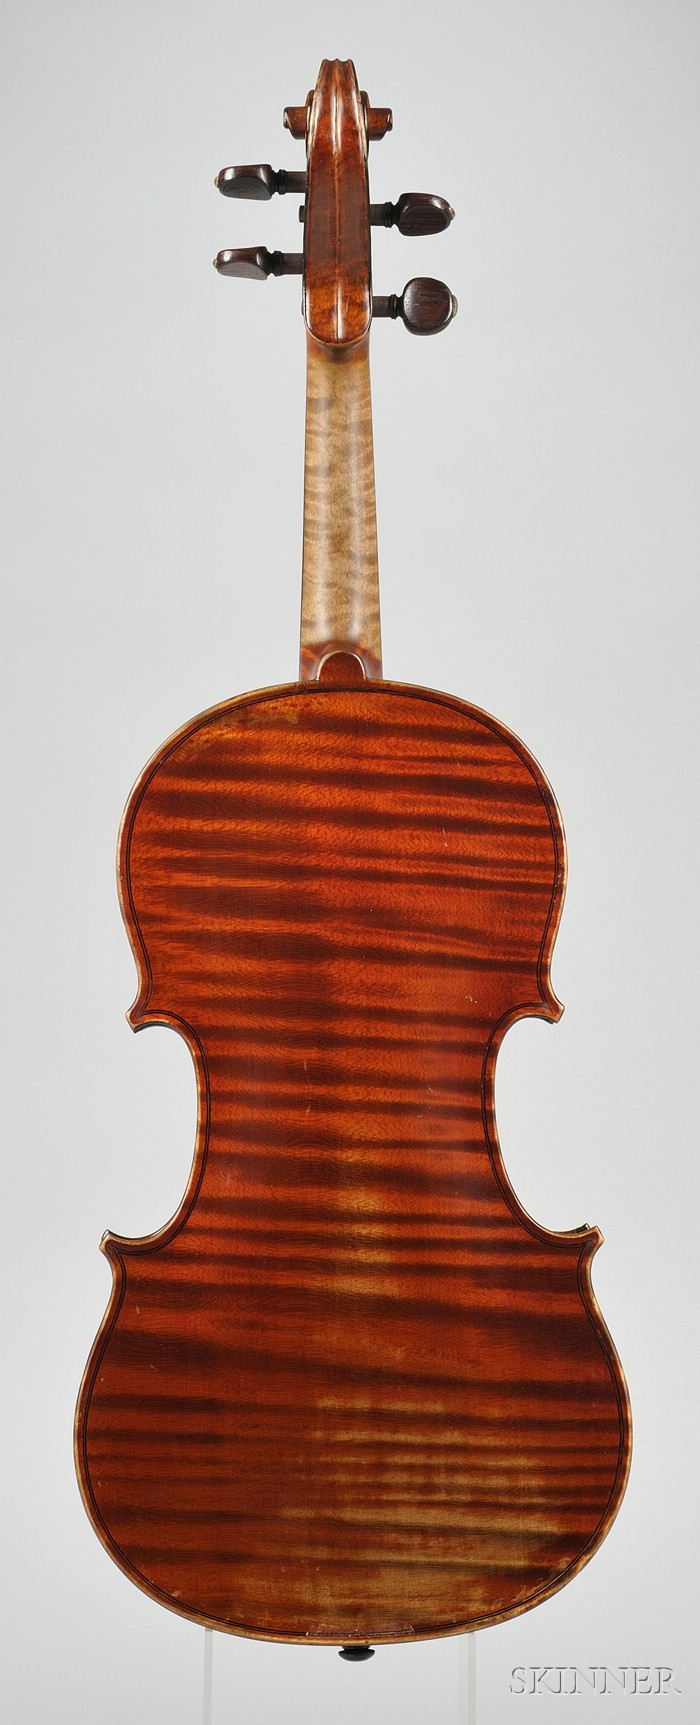 French Violin, Hippolyte Chretien Silvestre, Paris, 1896